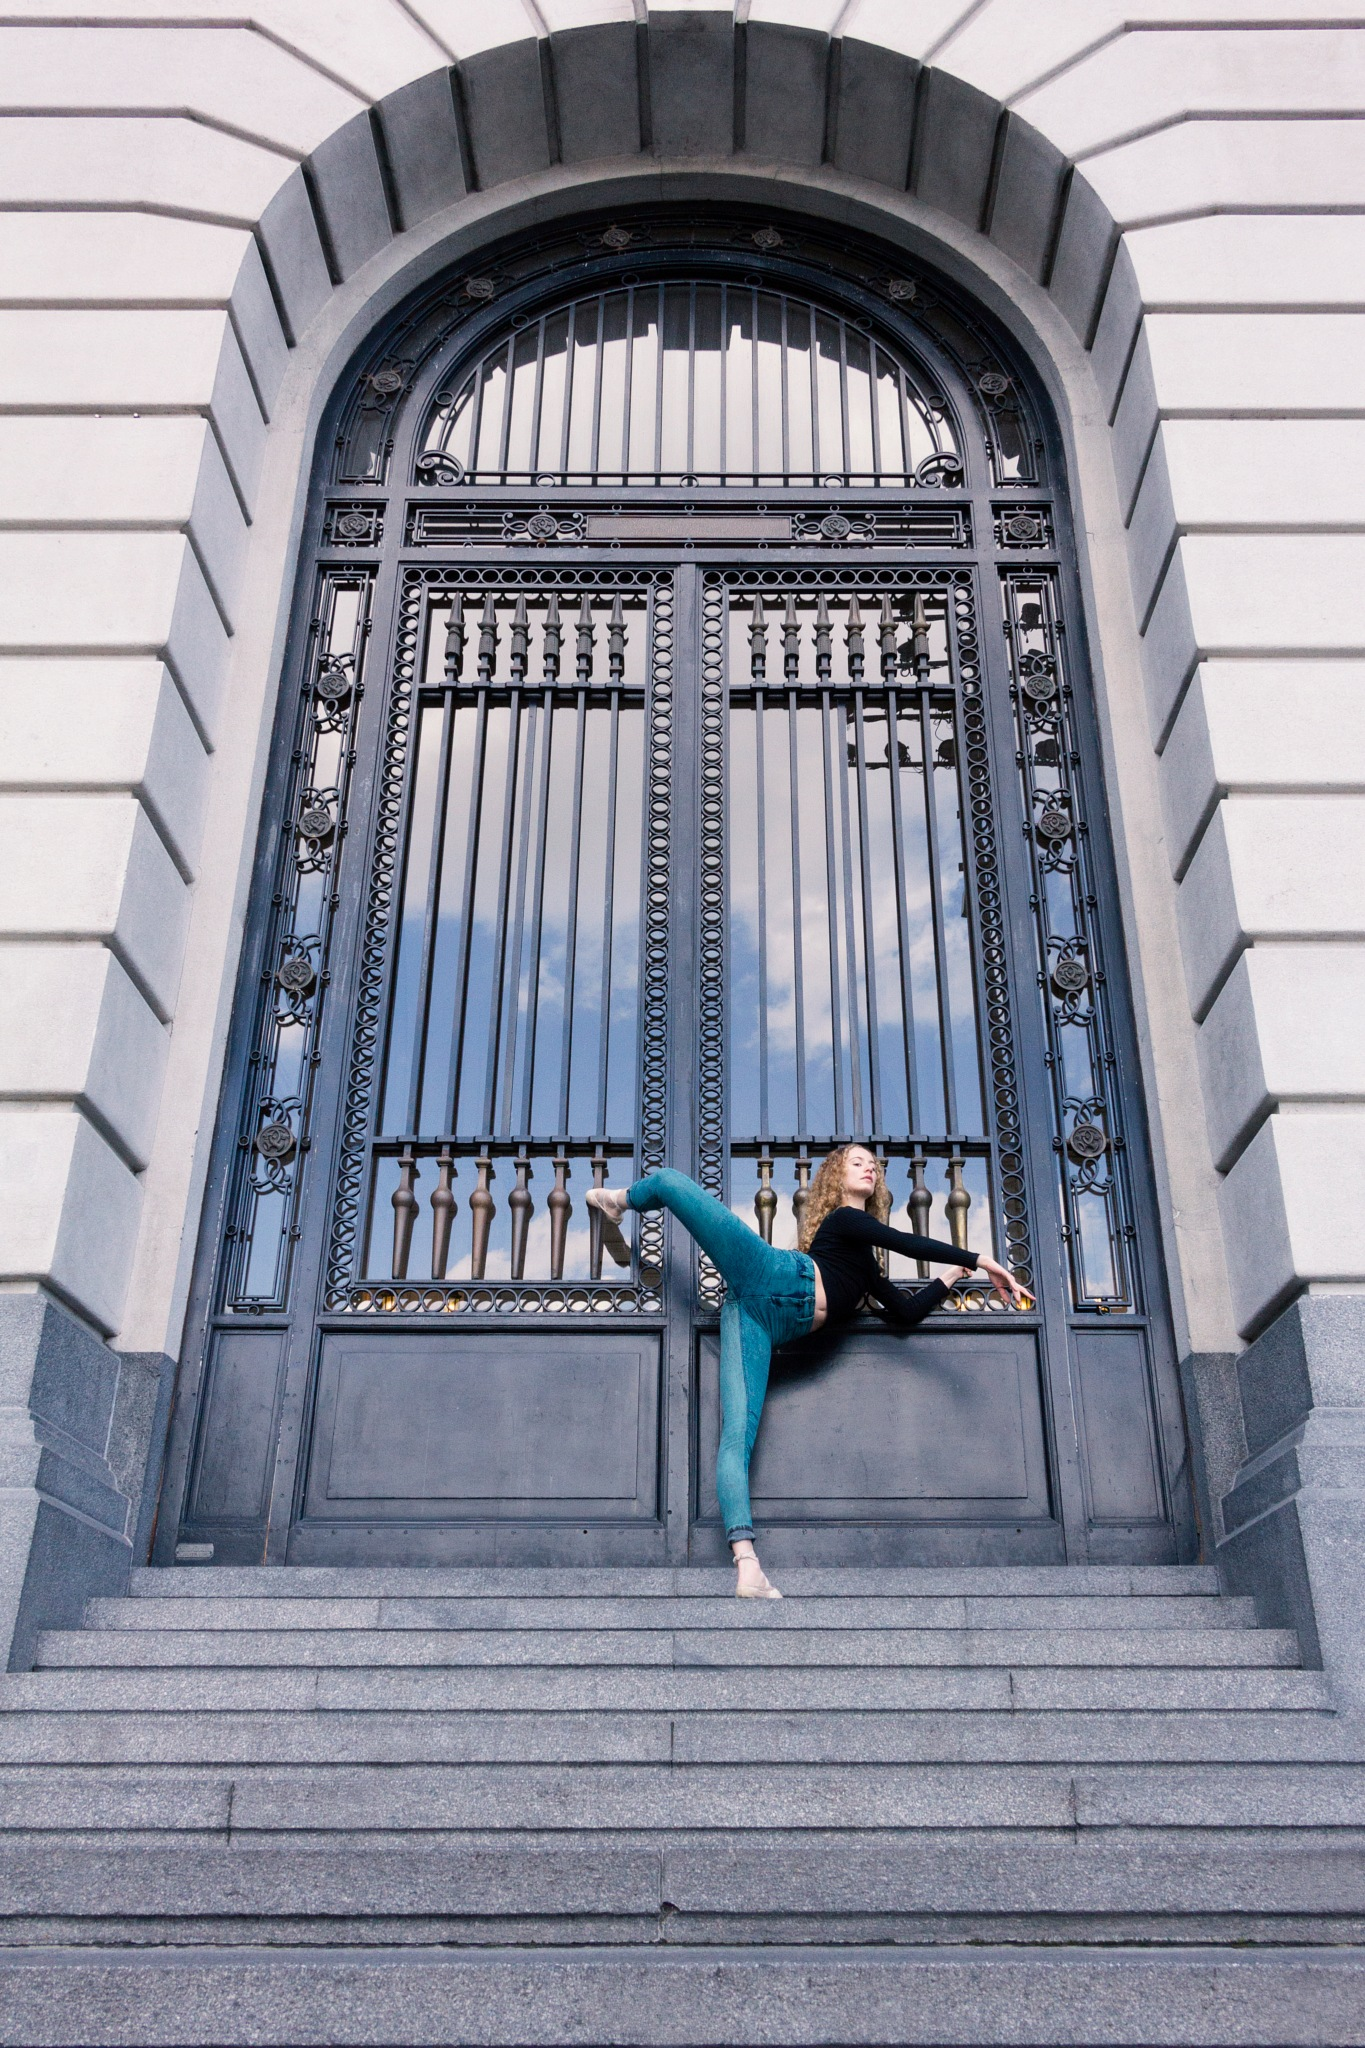 Knocking on heavens door by Daniela Lewkow